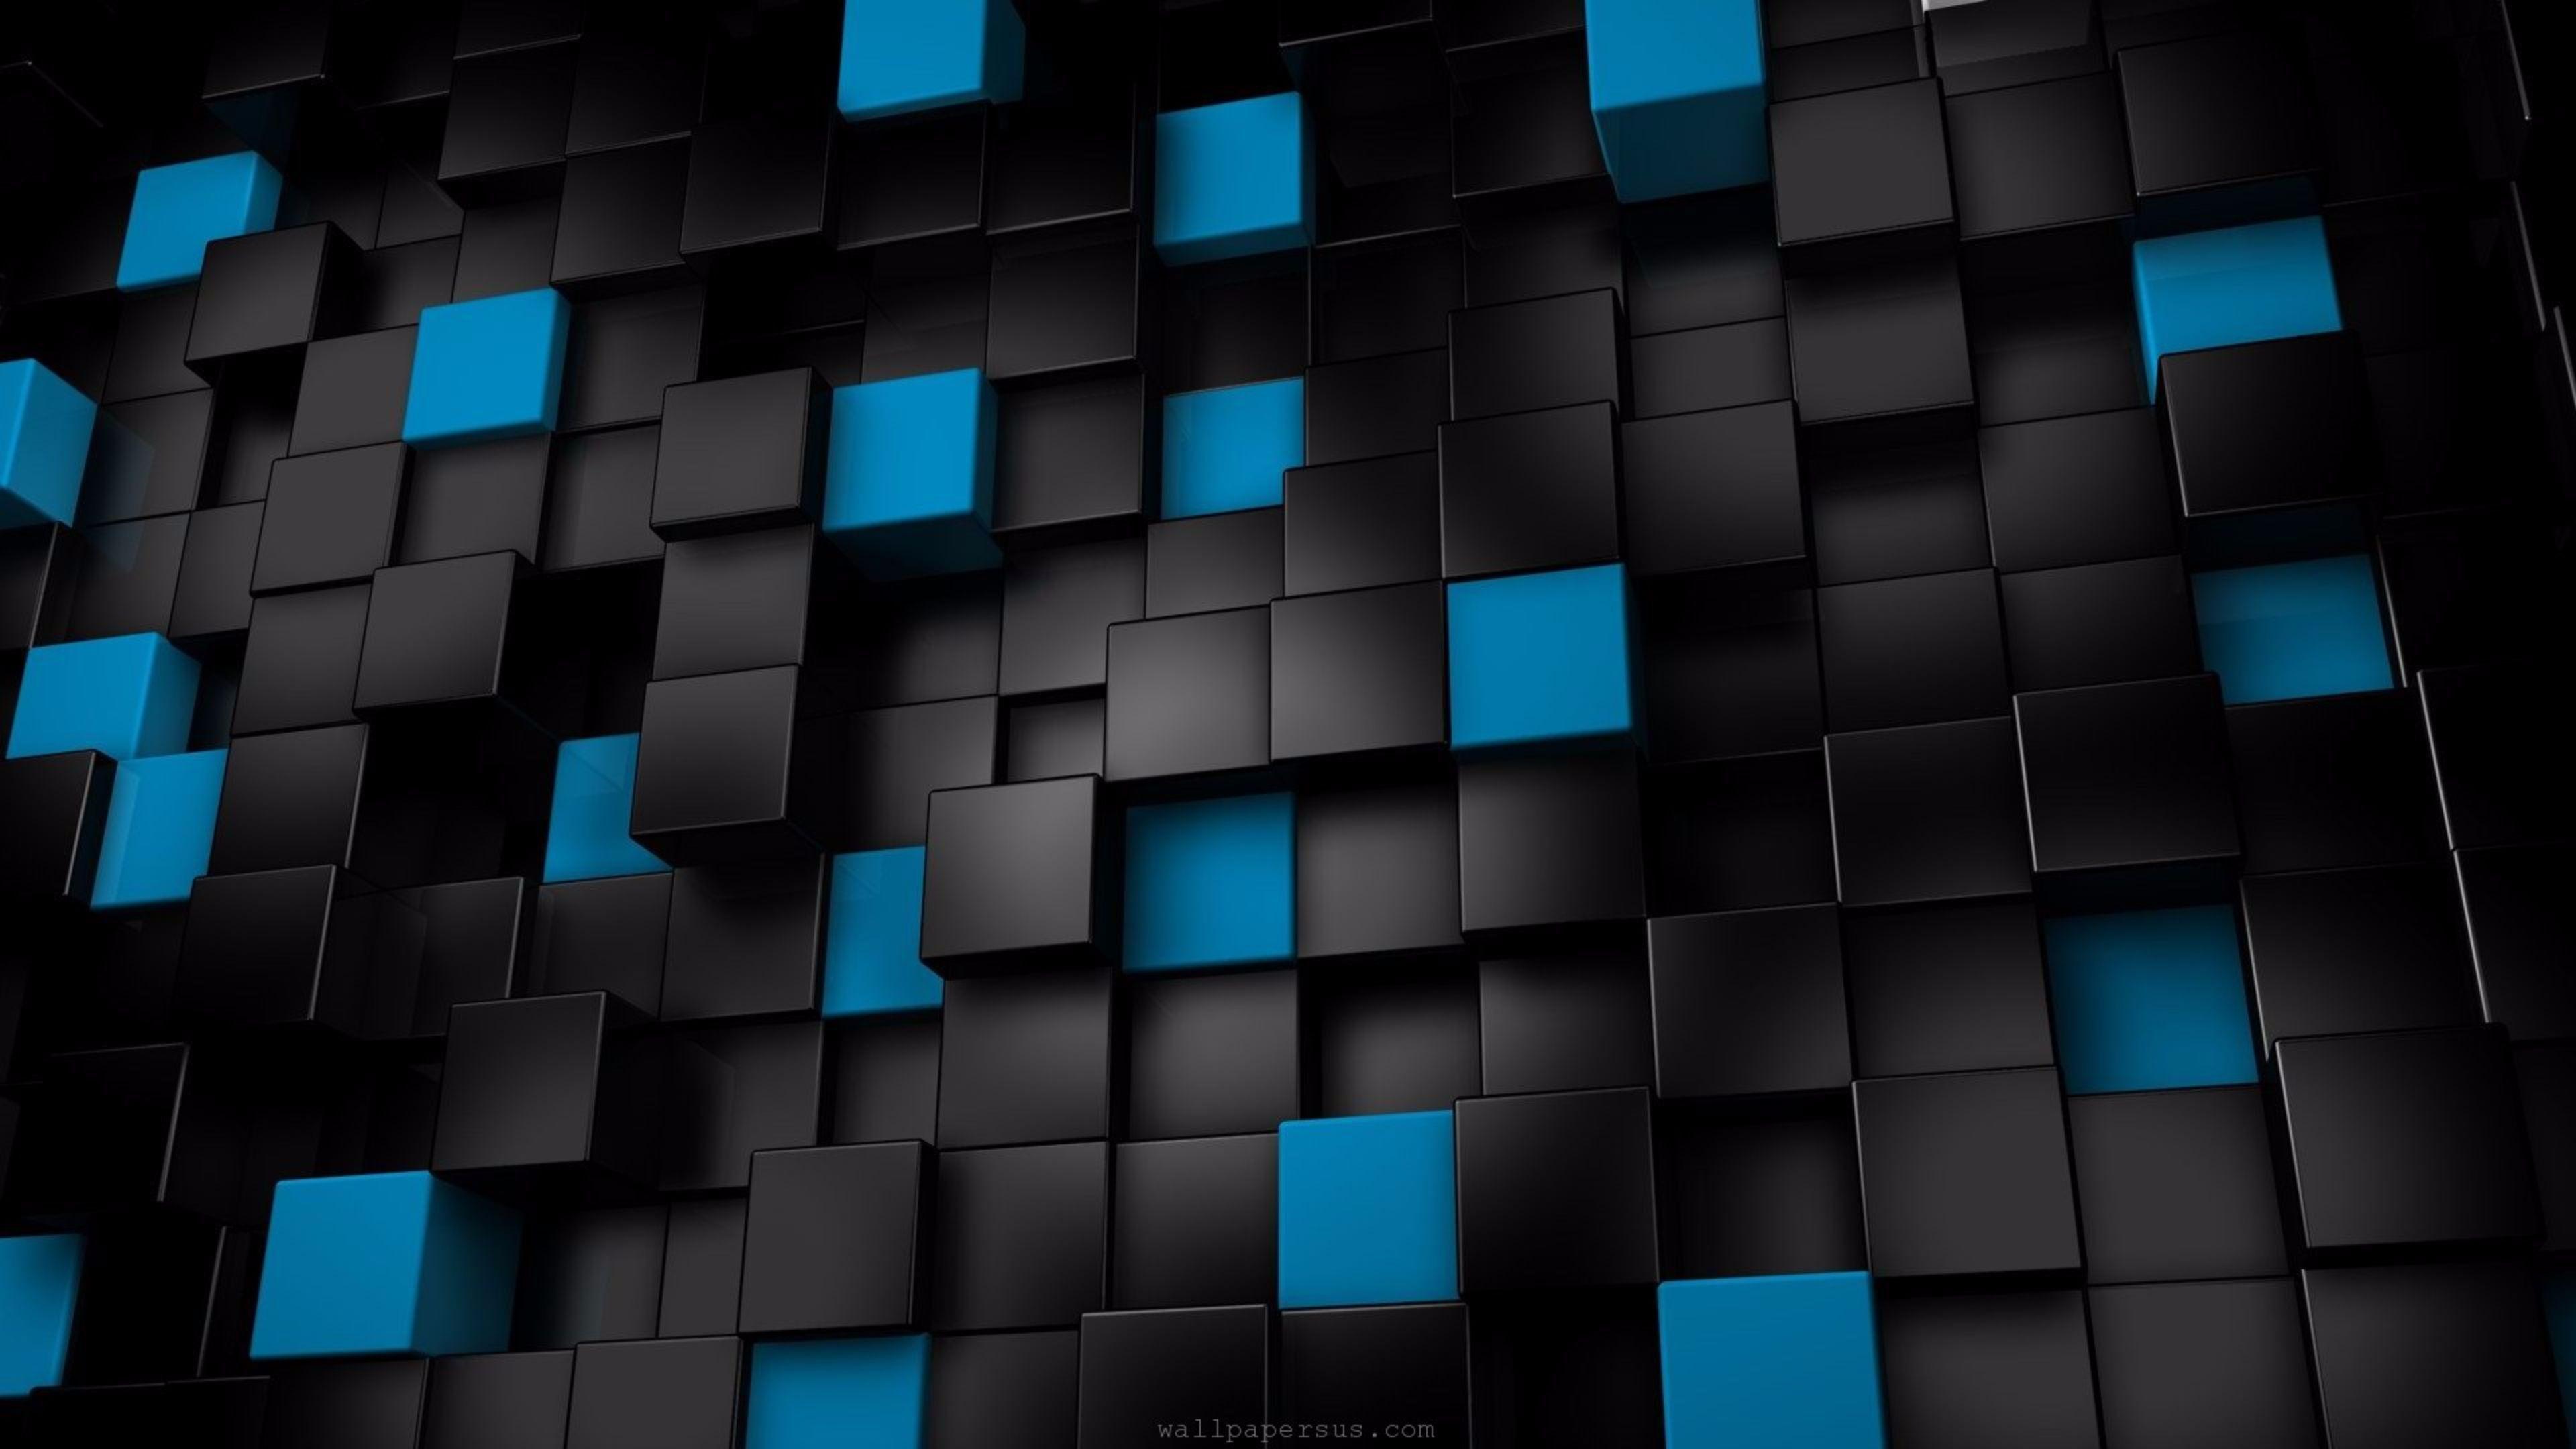 خلفيات كمبيوتر ثلاثية الأبعاد 3d Wallpapers Desktop Backgrounds Tecnologis Black And Blue Wallpaper Cool Blue Wallpaper Black Wallpaper